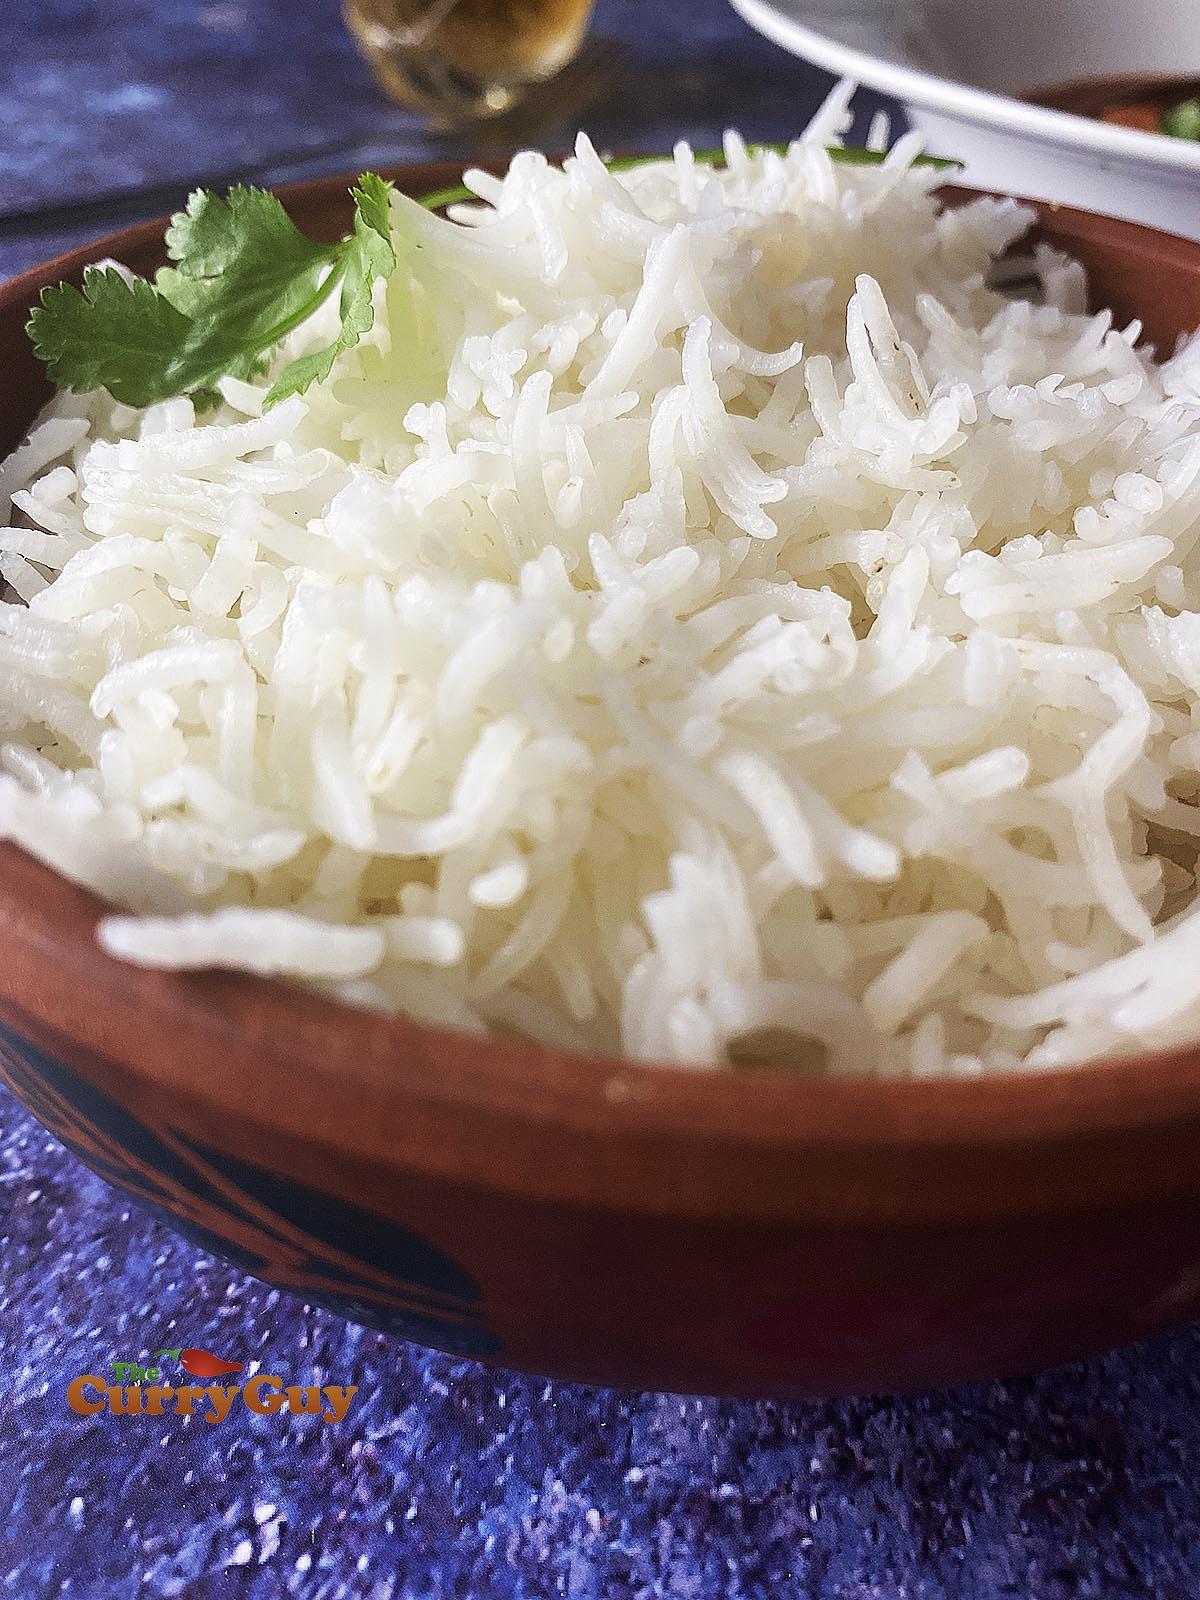 My Basmati rice recipe